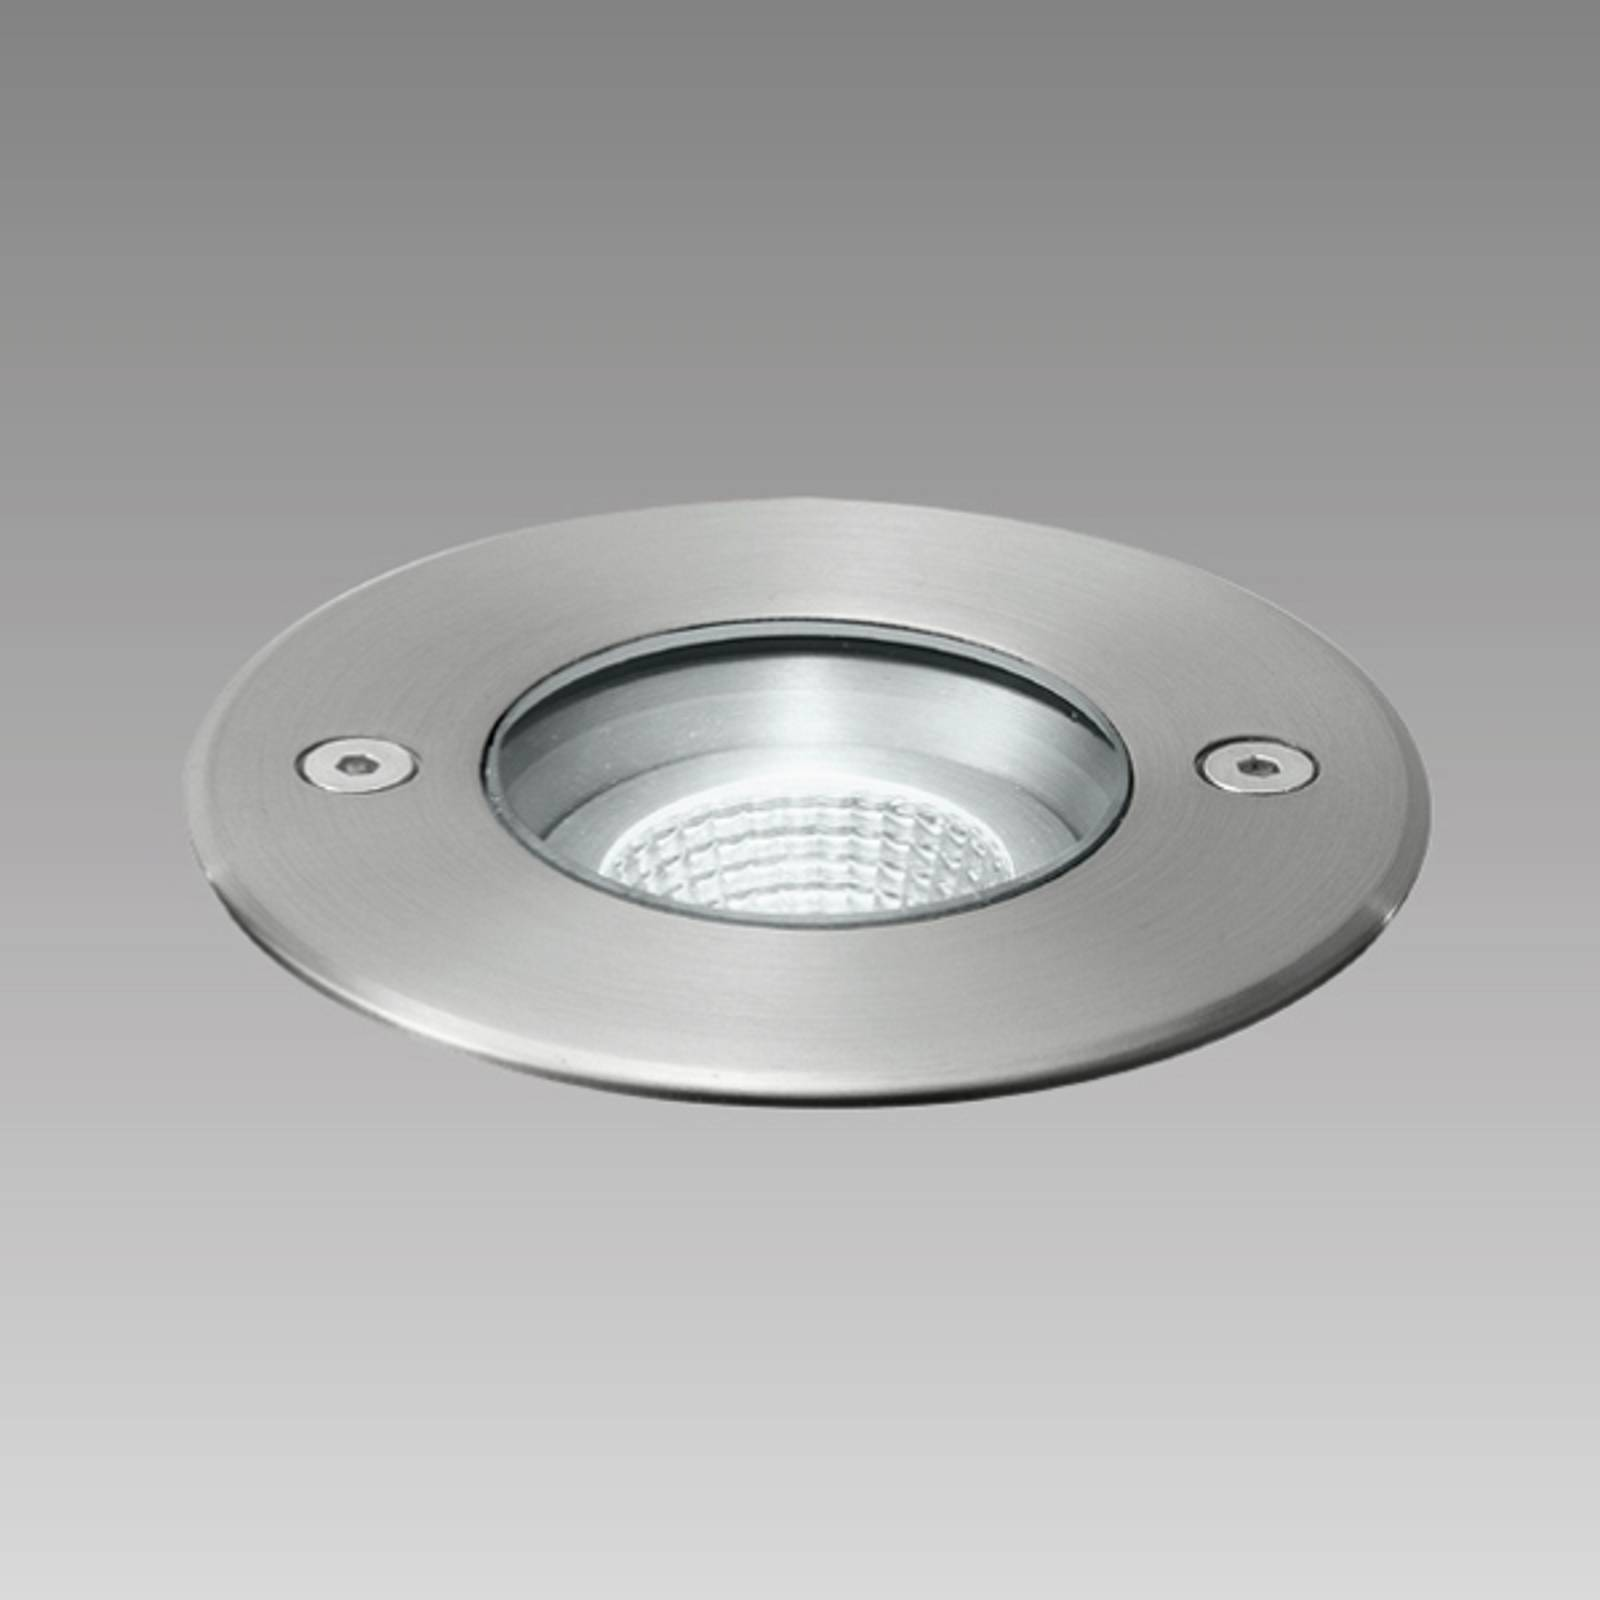 Roestvrijstalen-inbouwspot Frisco LED, IP67